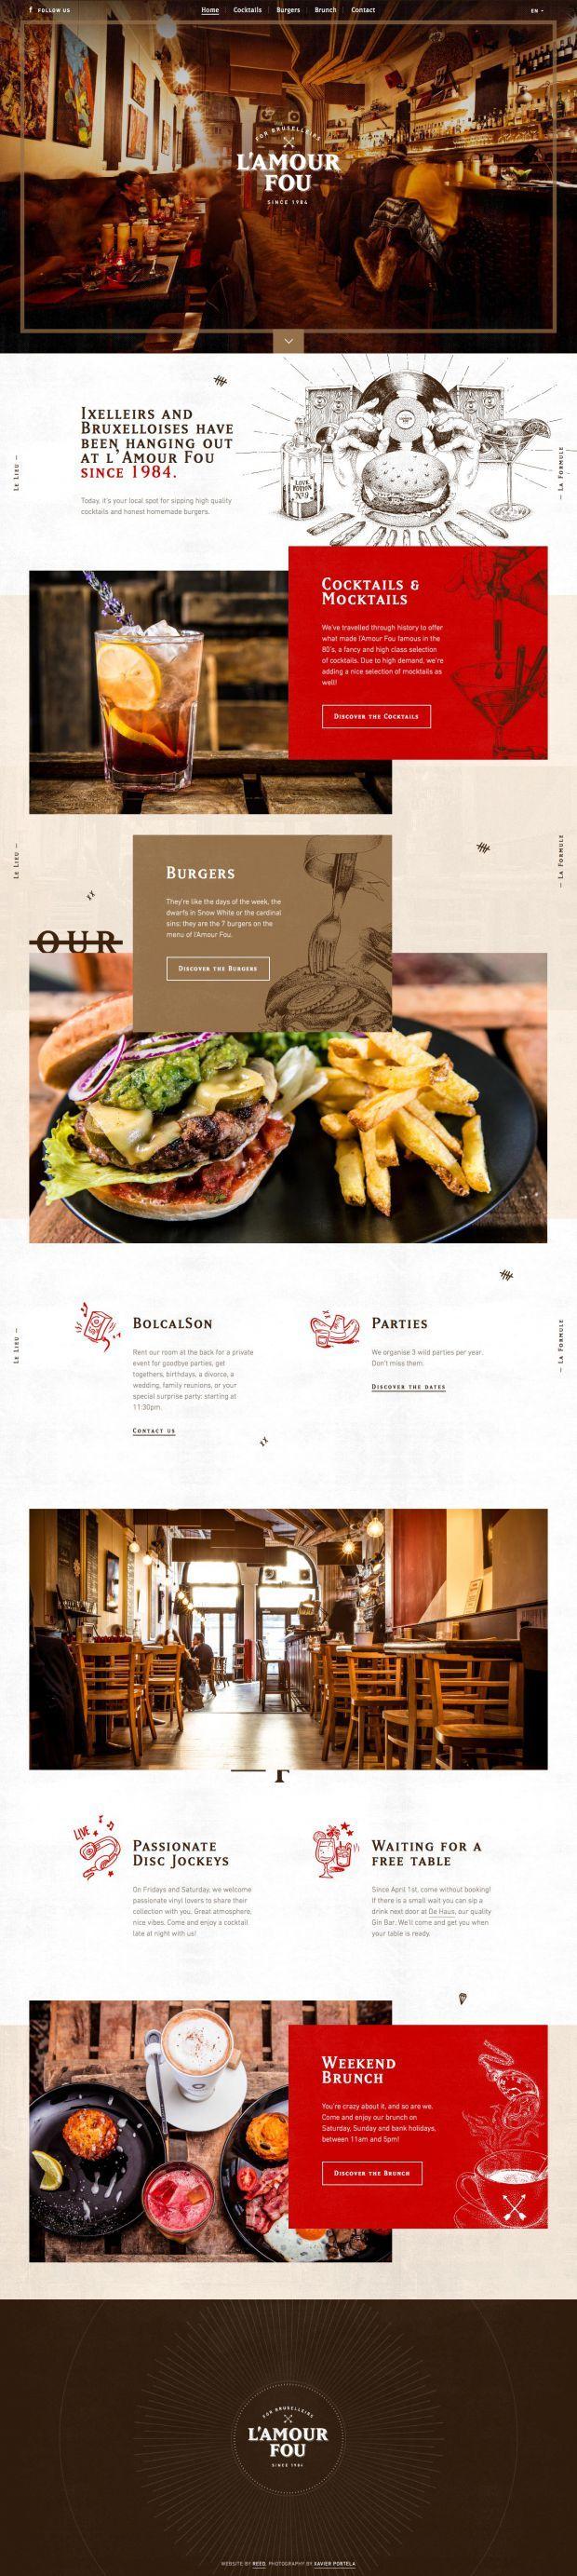 L'Amour Fou. Classic burger bar. #webdesign (More design inspiration at www.aldenchong.com)